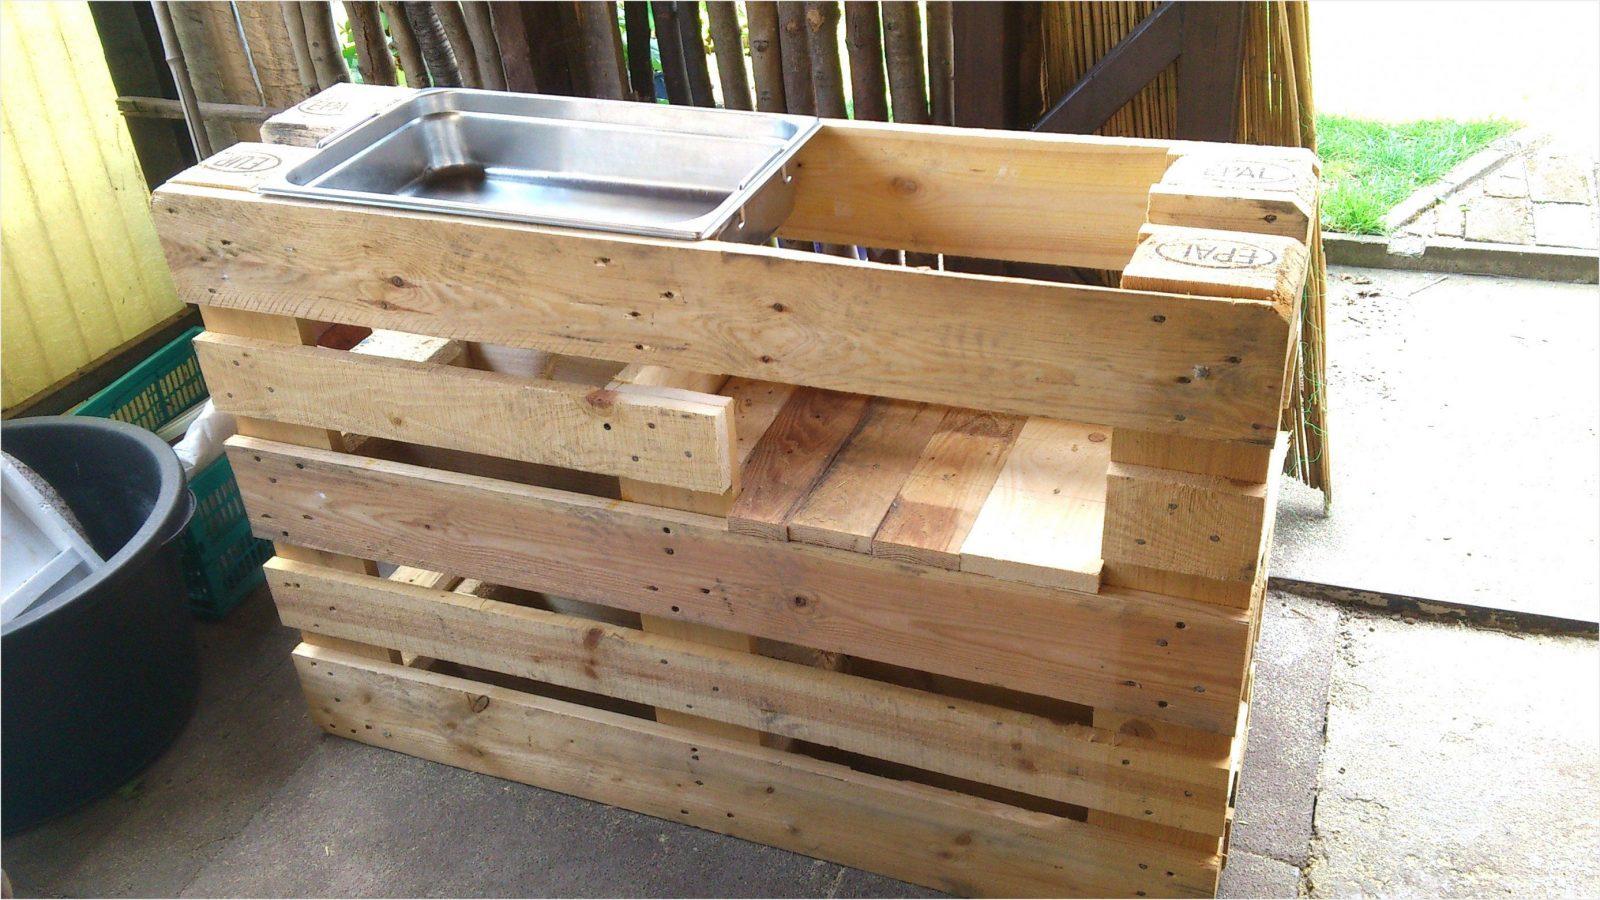 Wohndesign hervorragend outdoor kuche selber bauen von for Outdoor kuche selber bauen